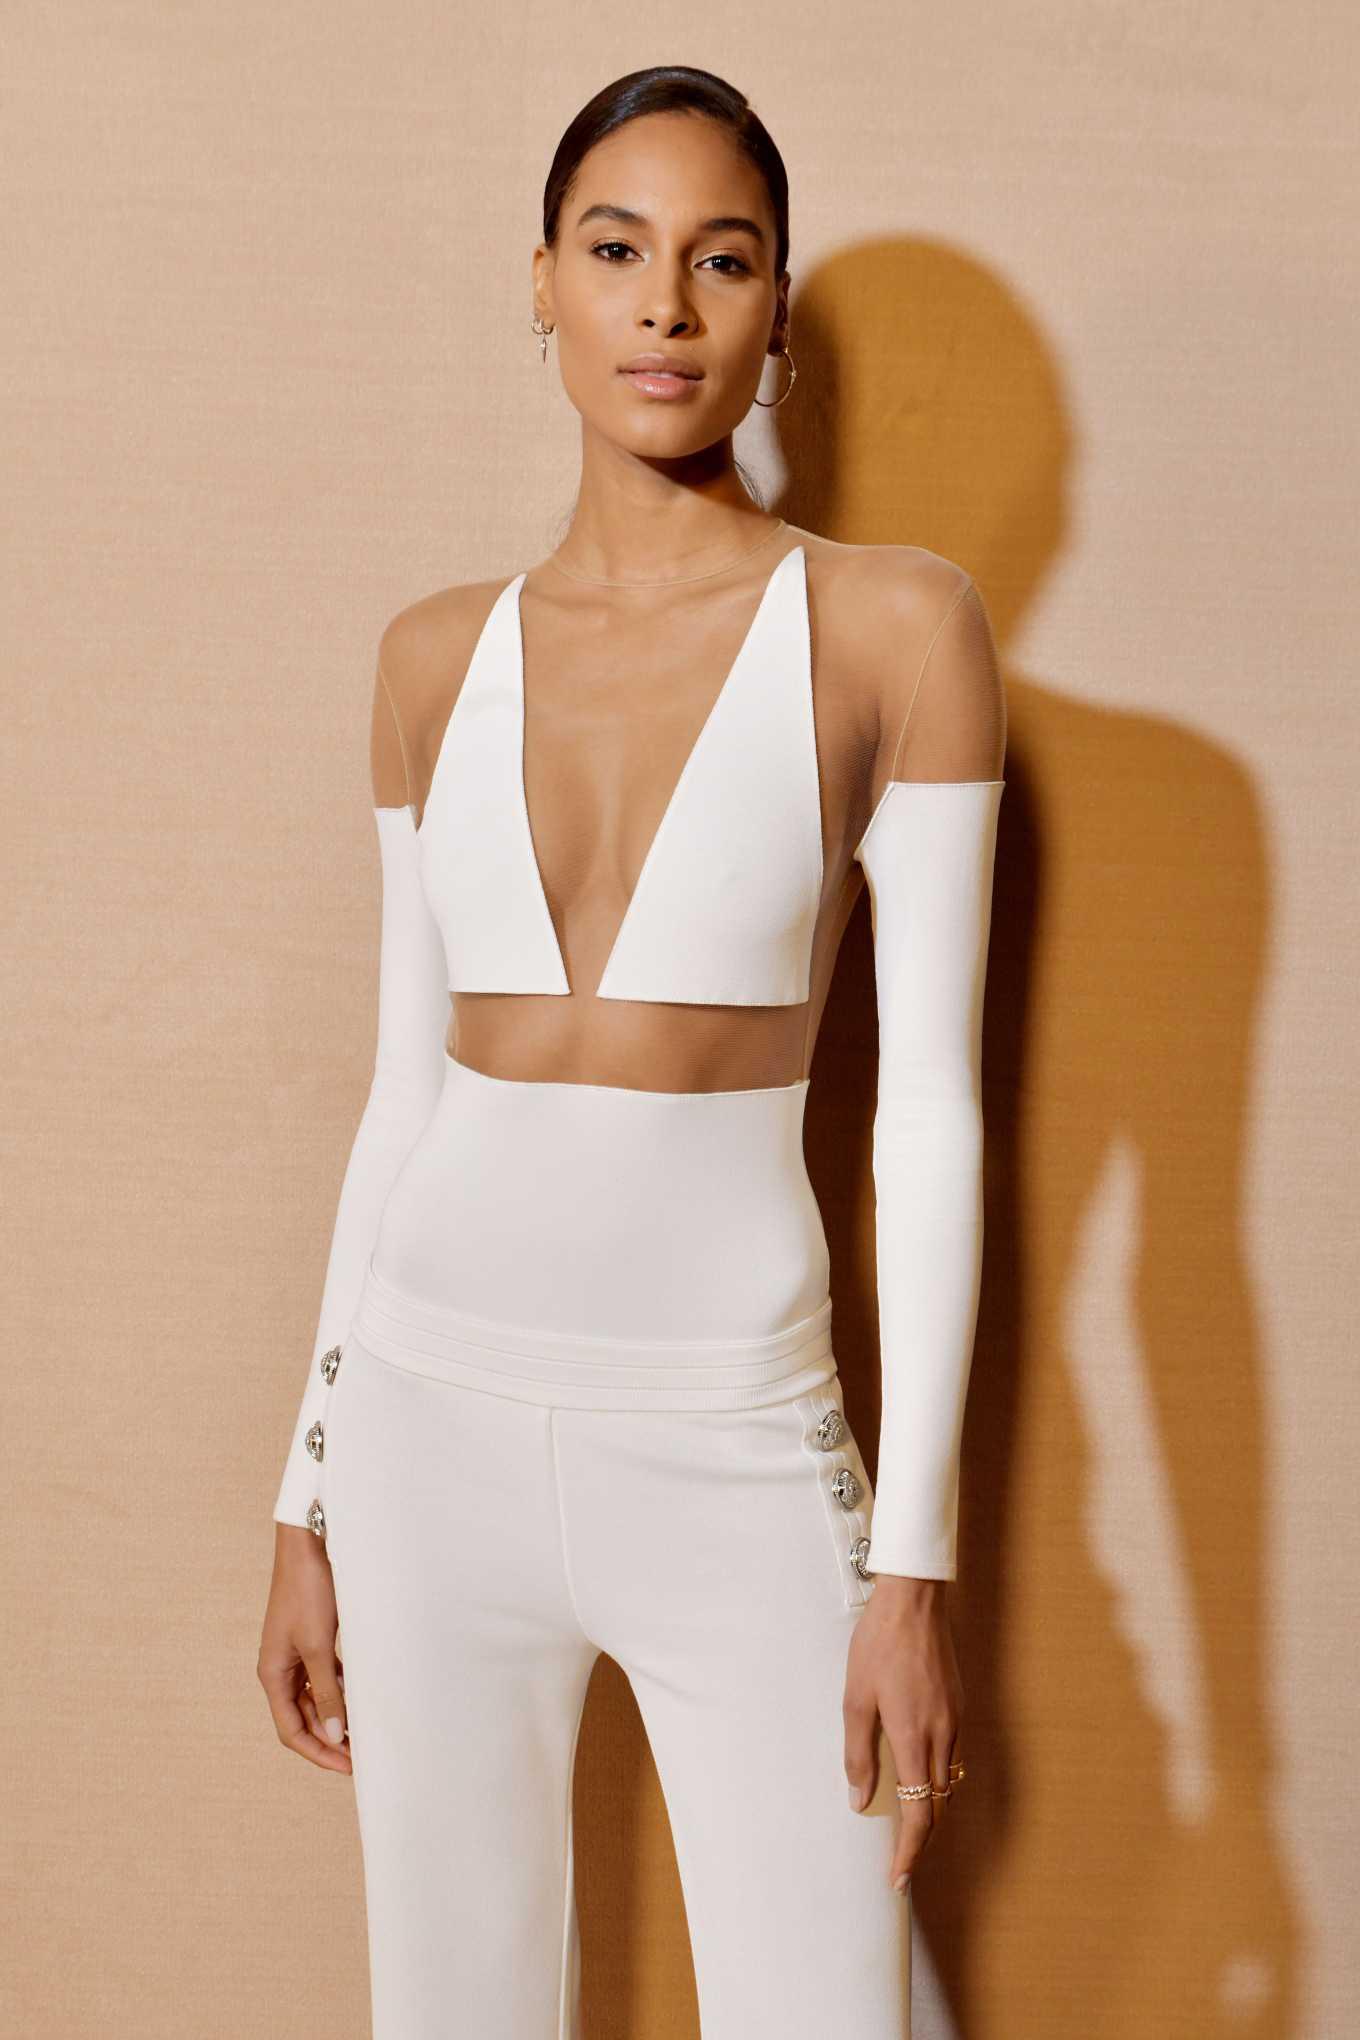 Cindy Bruna - Balmain Fashion Show at Paris Fashion Week 2020